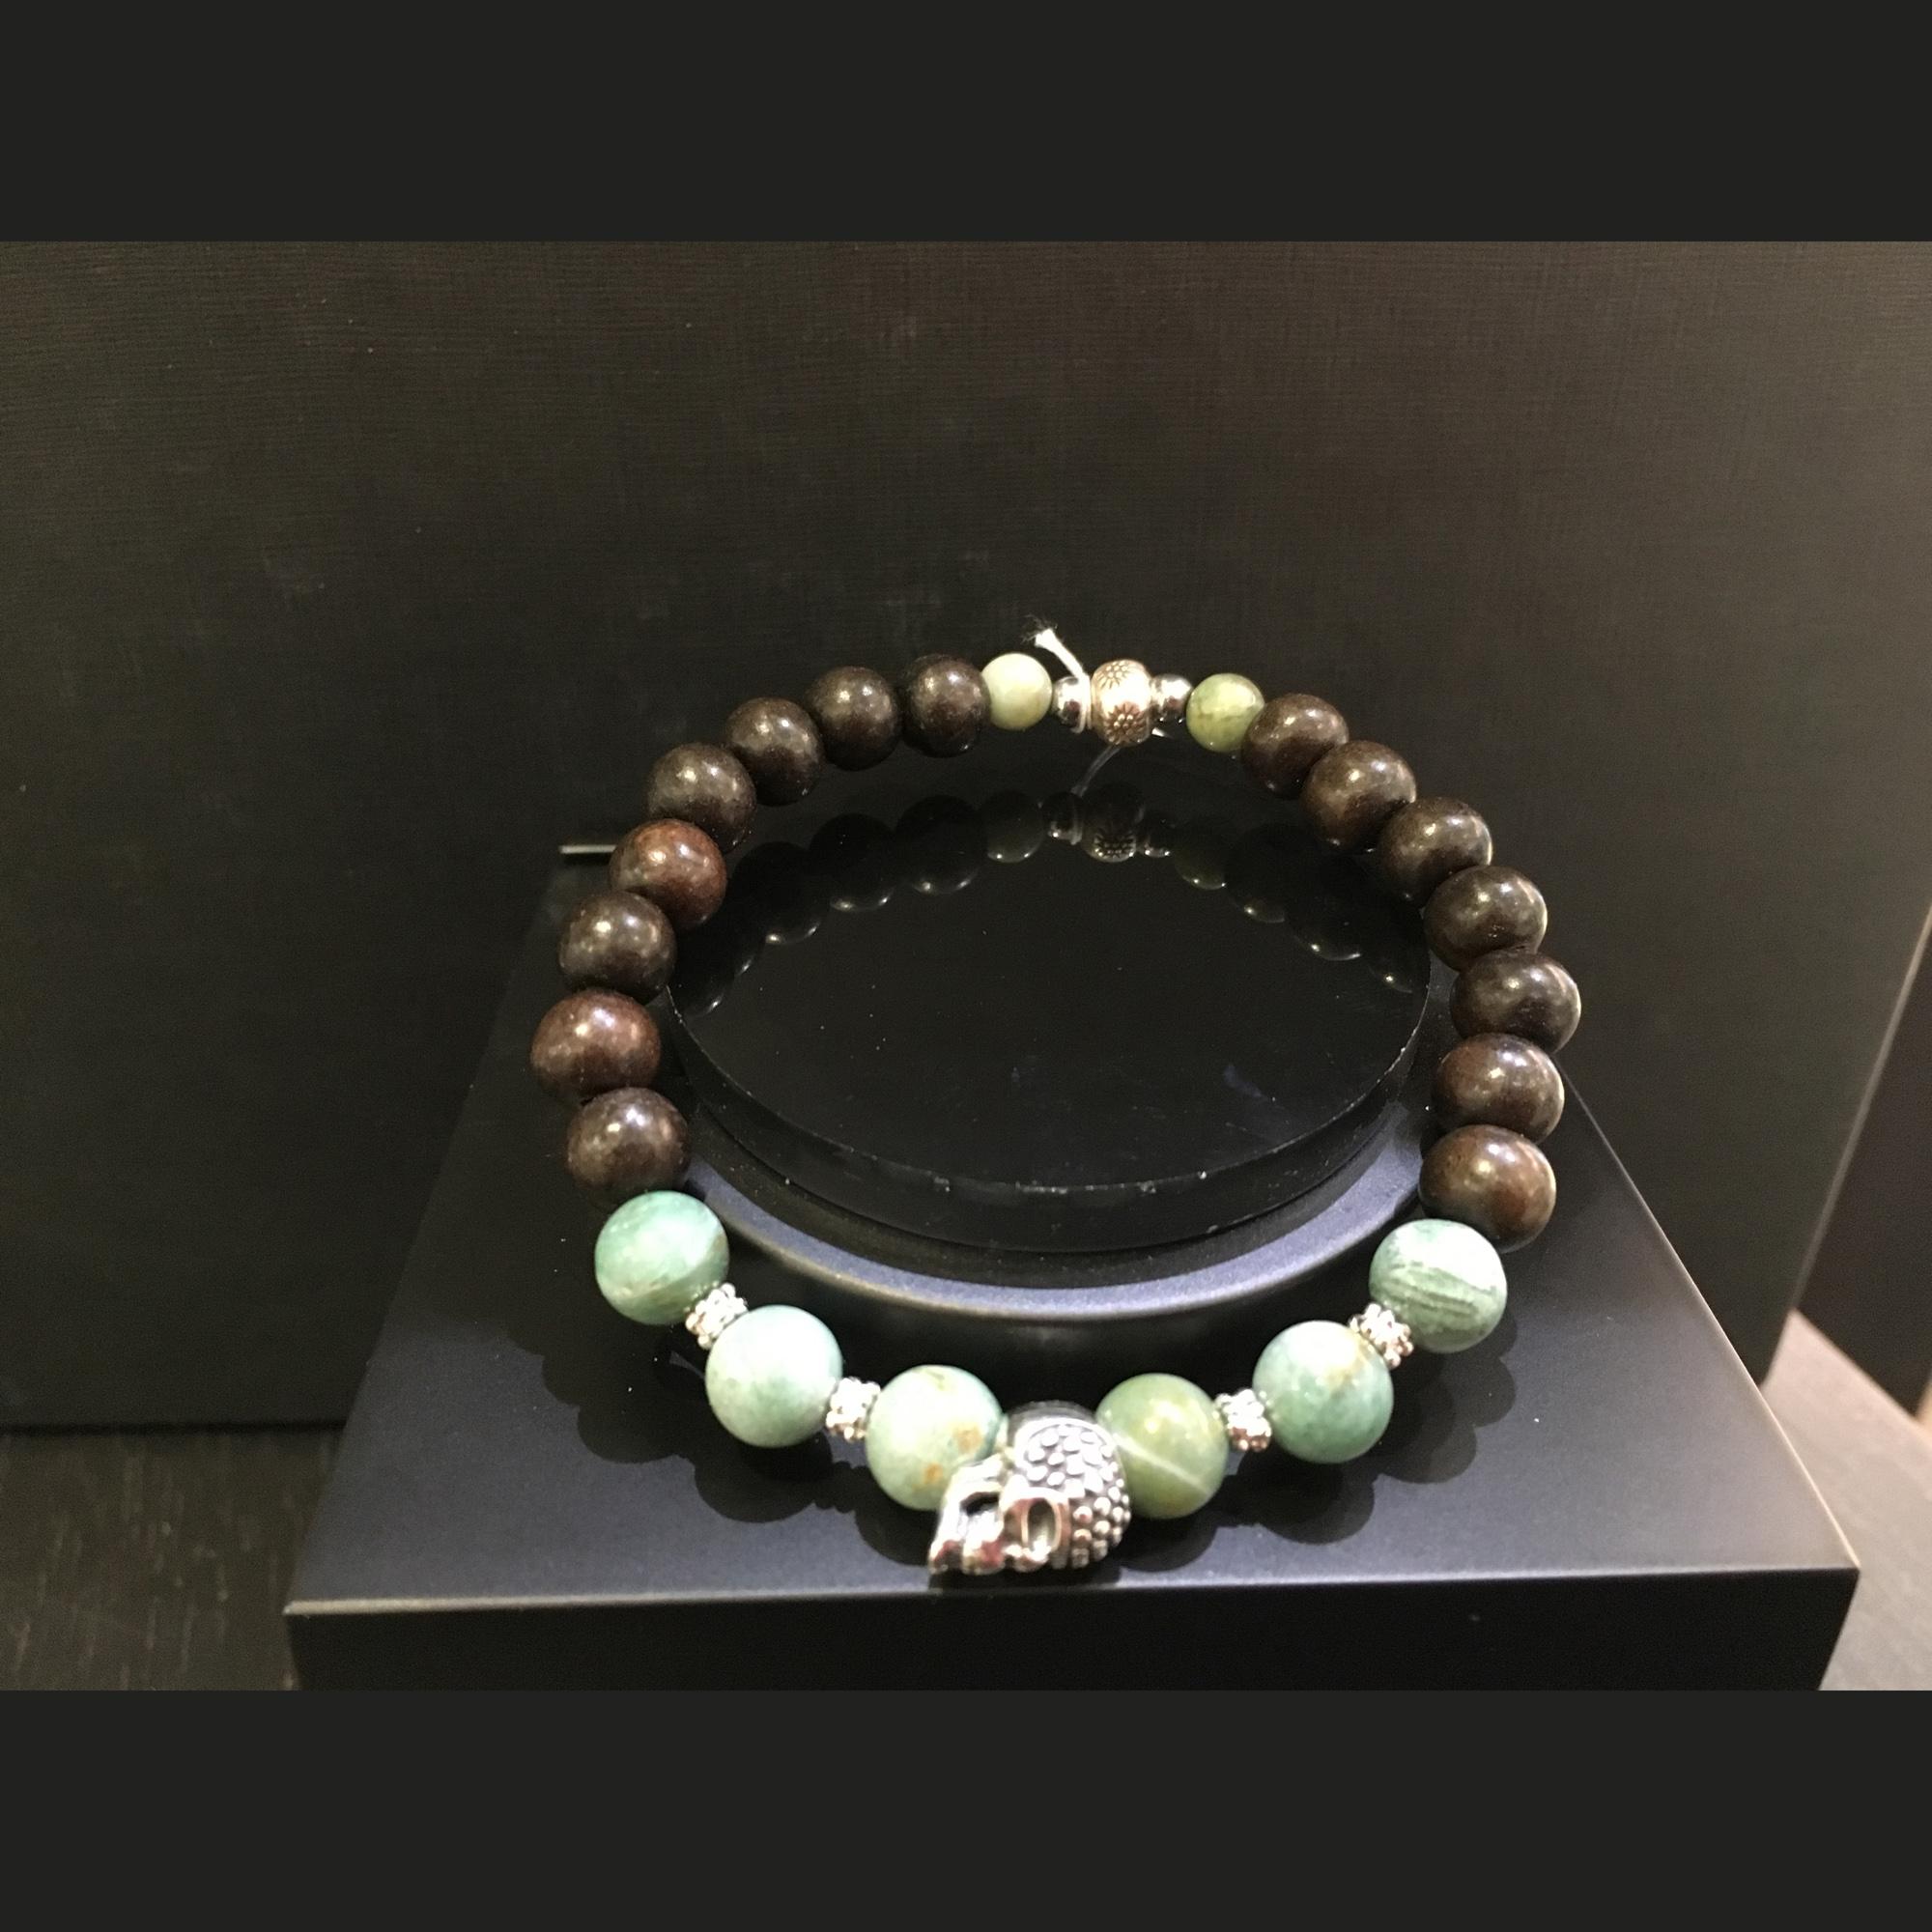 Bracelet14